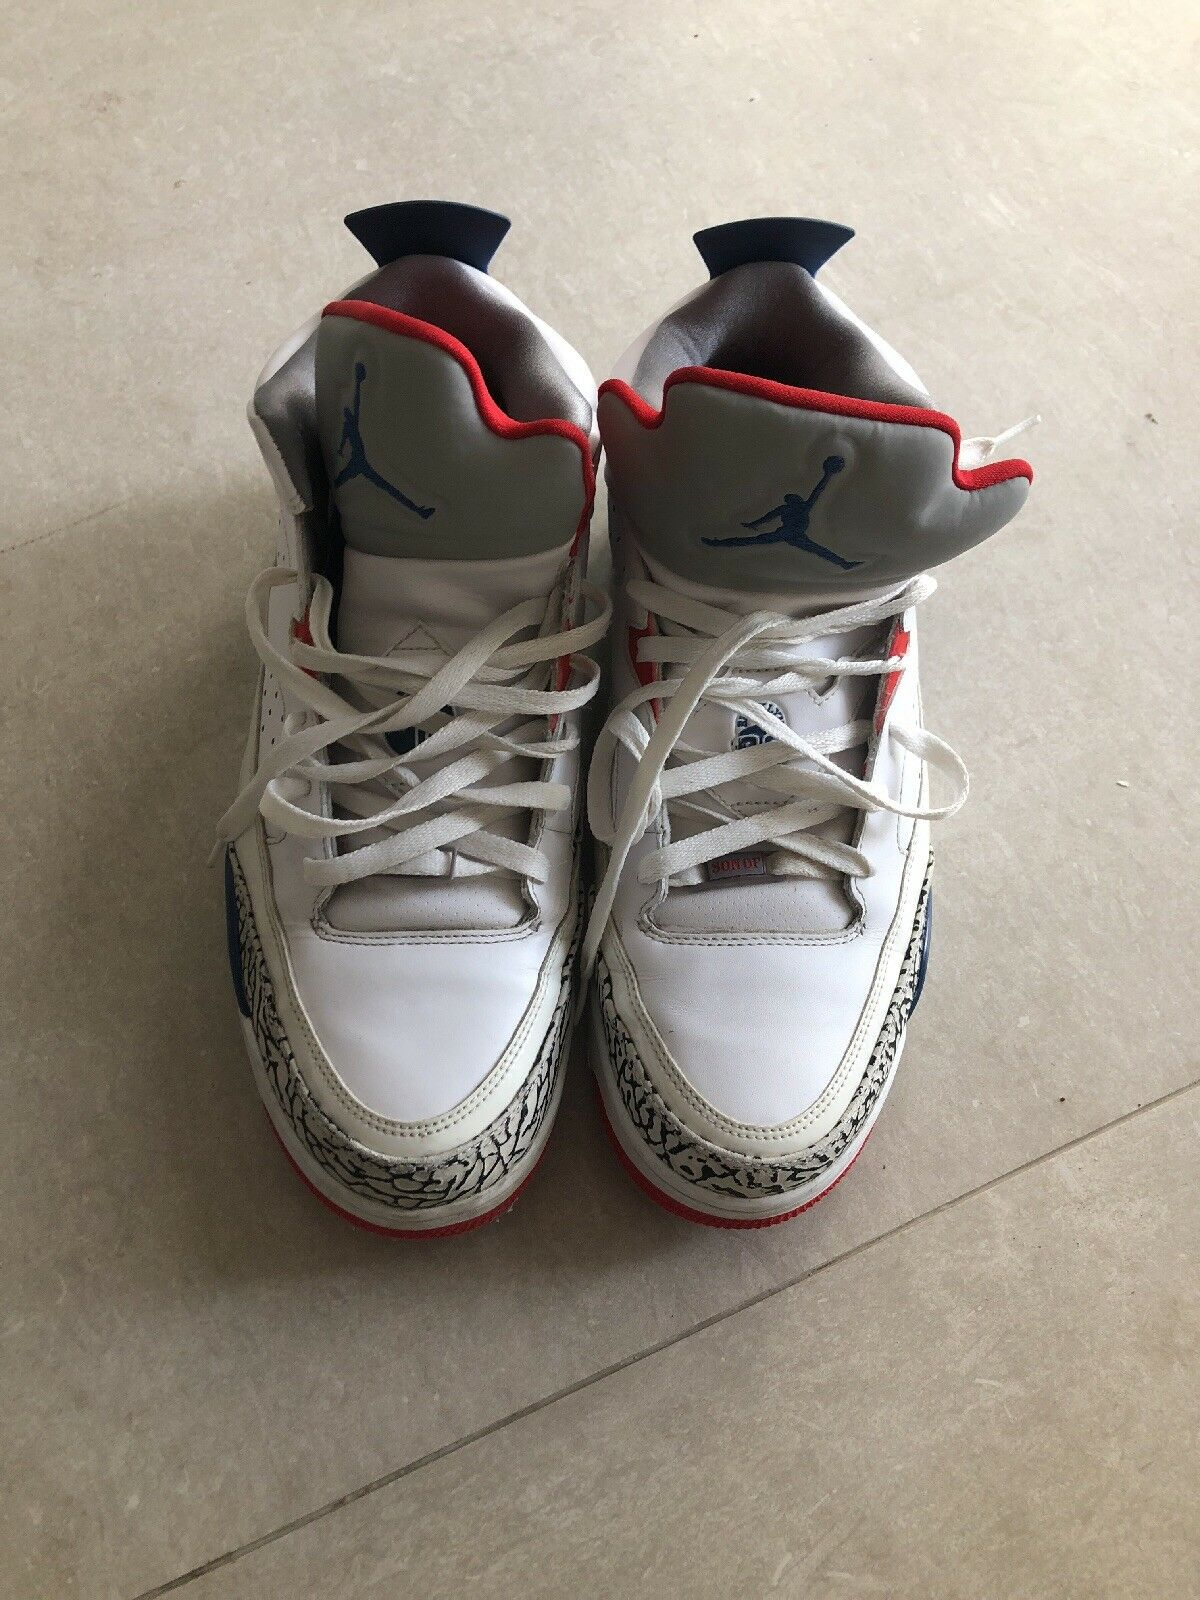 Mens Jordan's  Size 12